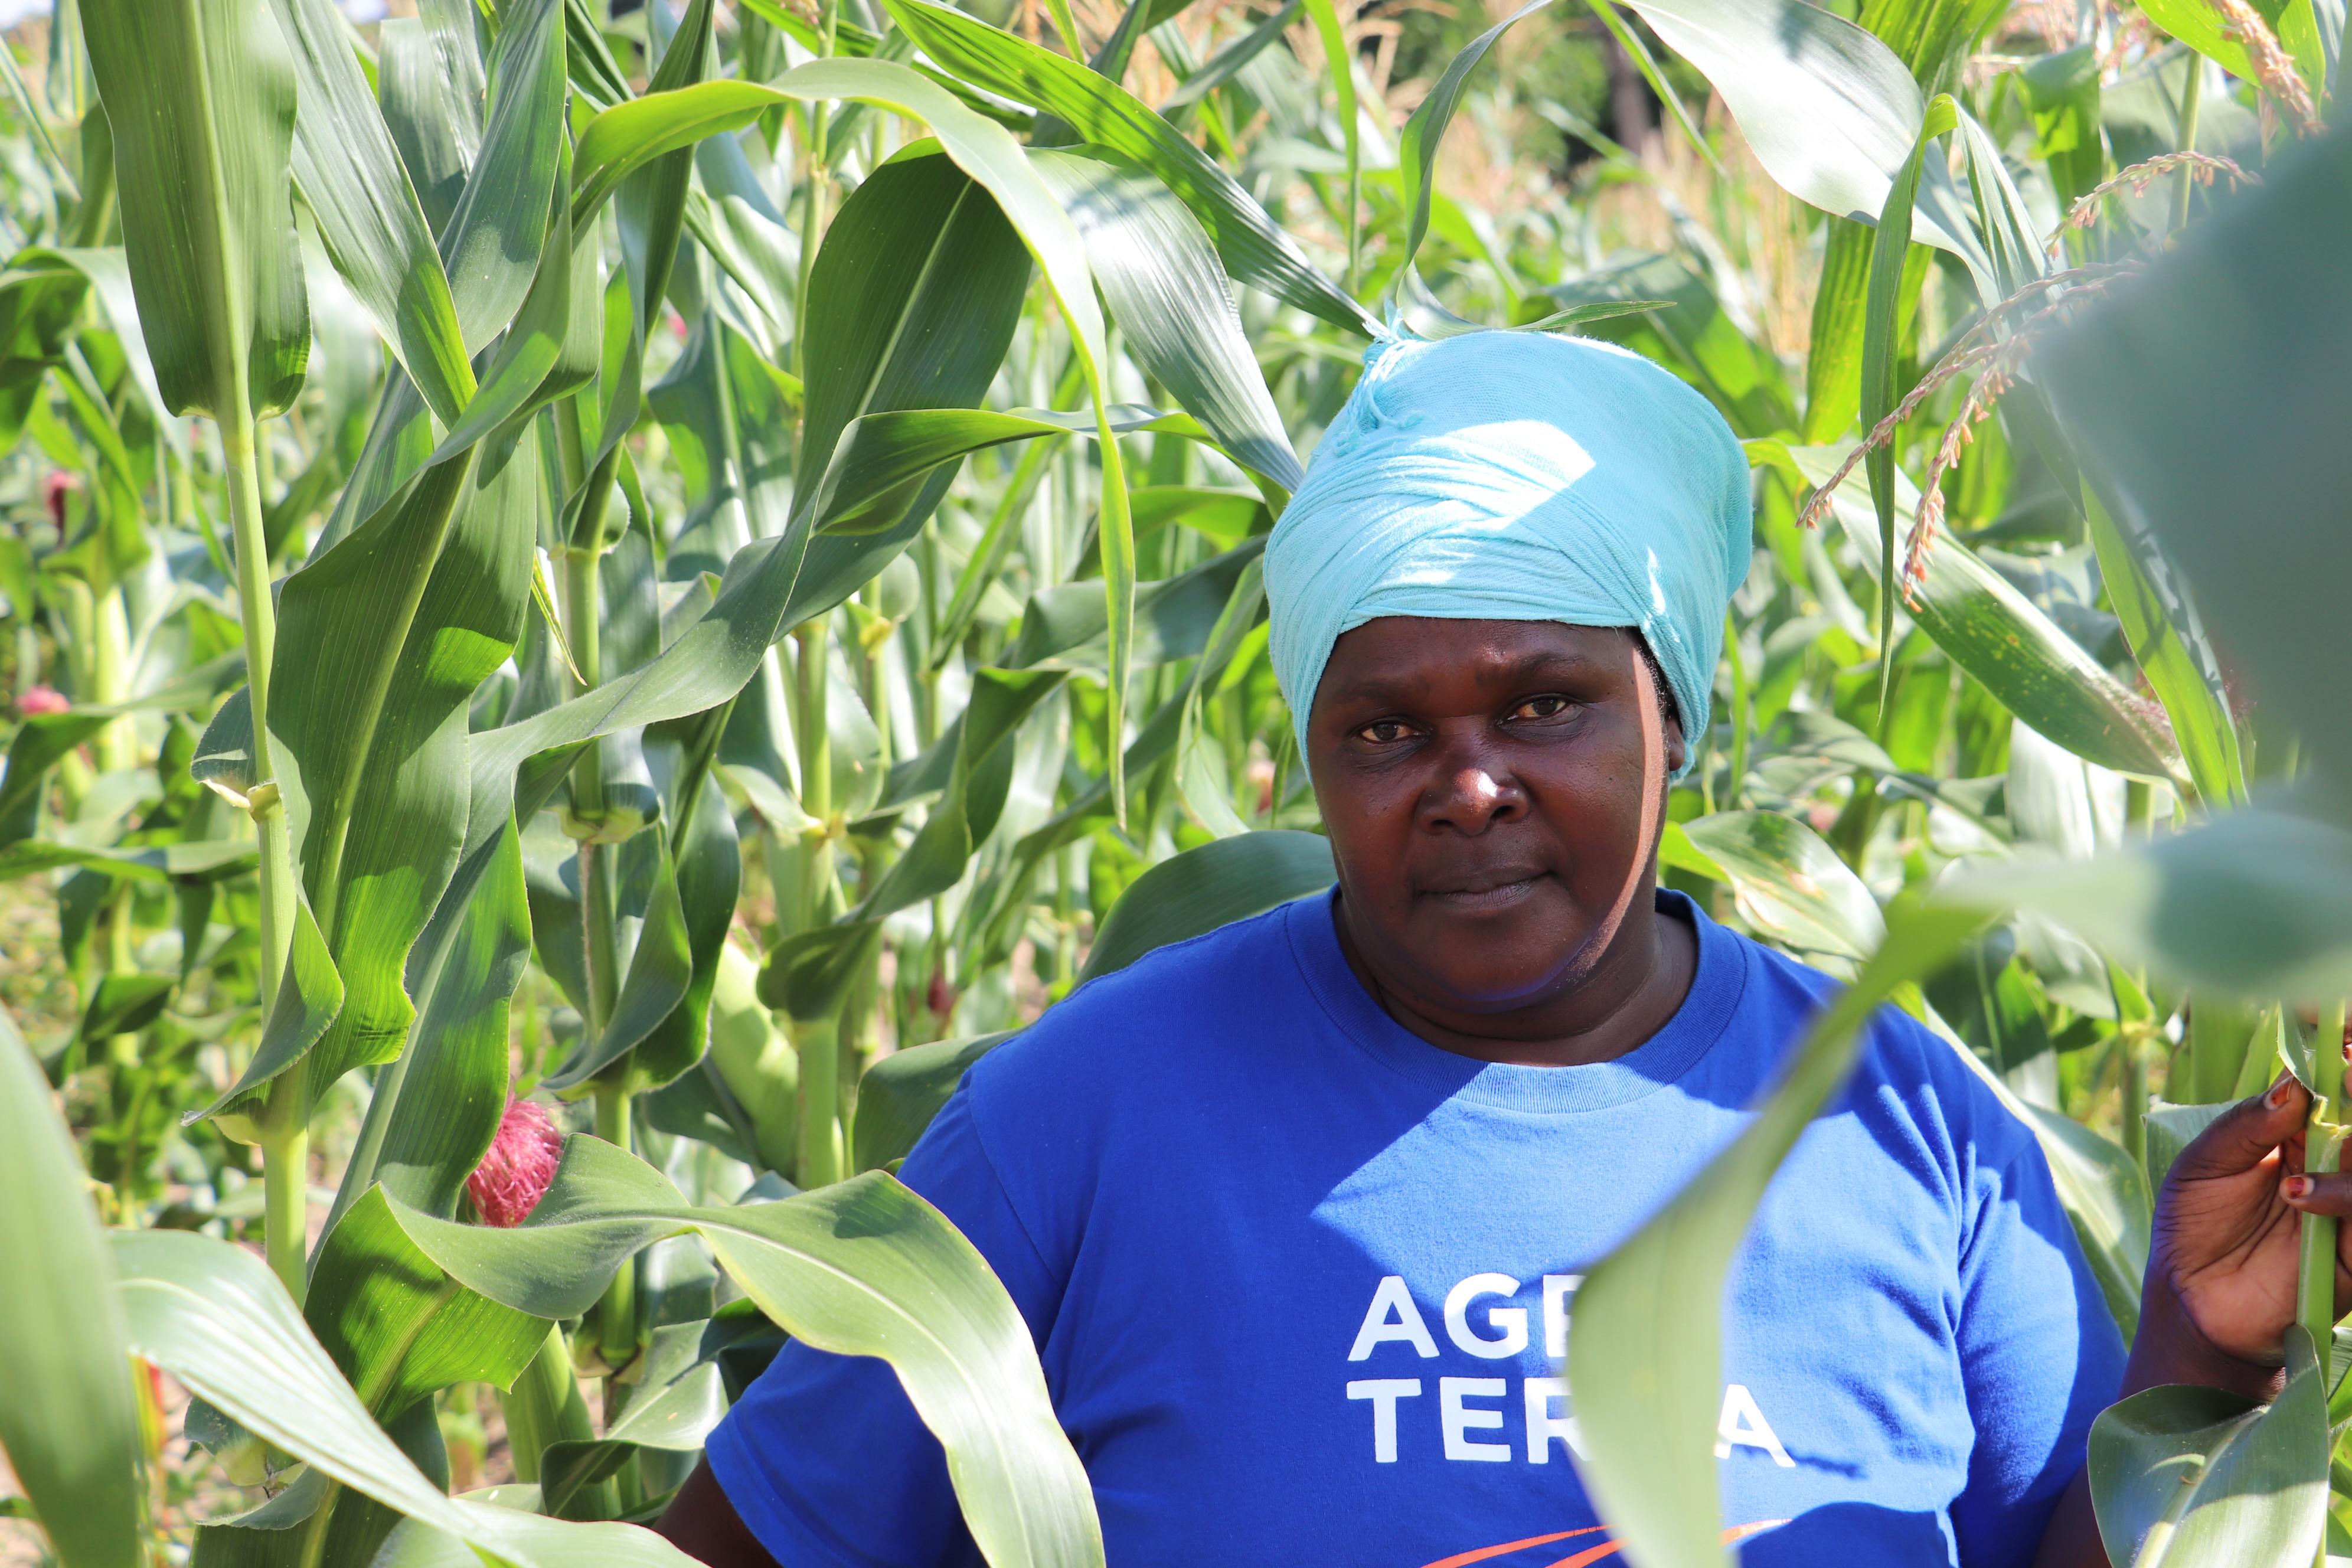 Farming-Specific Loans Help Tanzania's Smallholders Increase Productivity